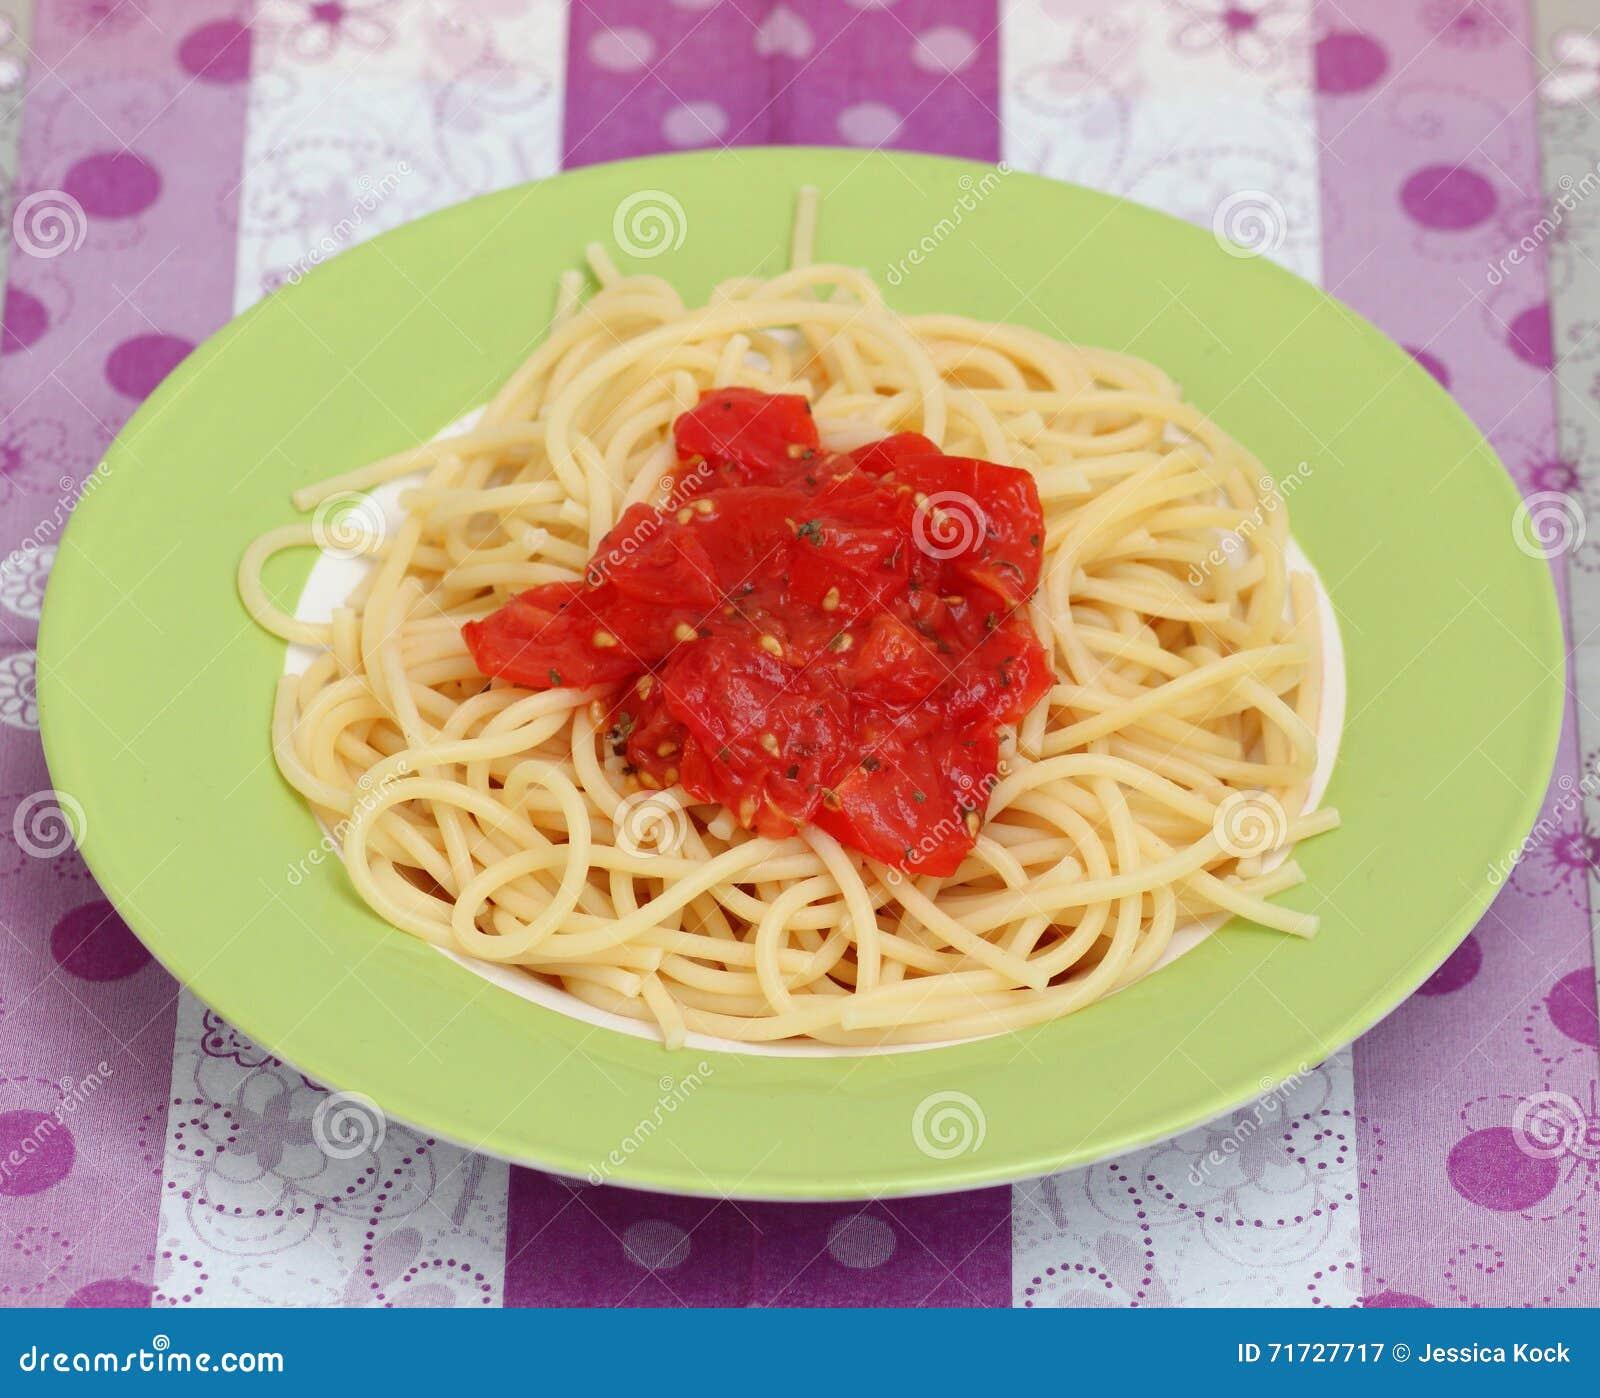 Italienische Teigwaren